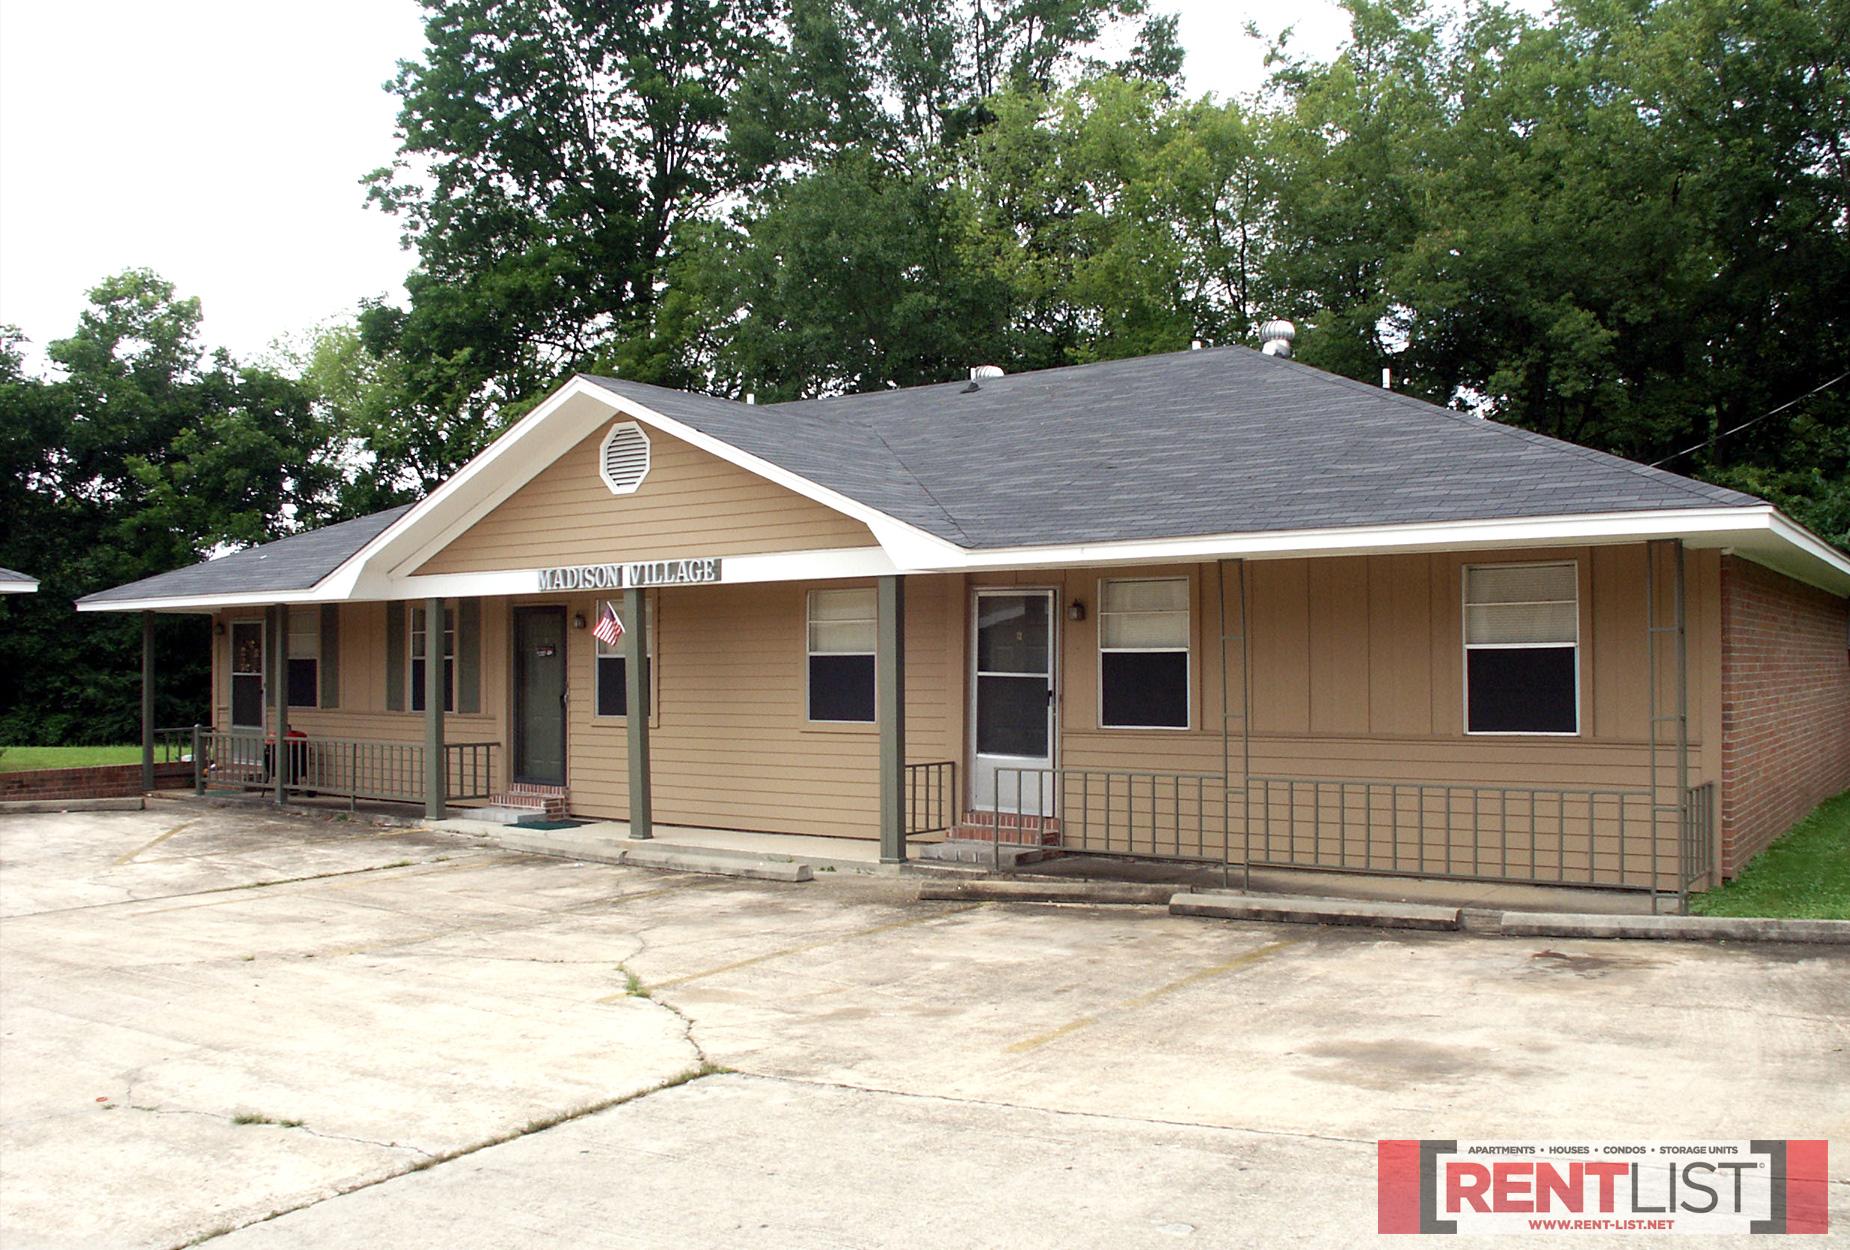 Madison Village & Madison Village - Rent List